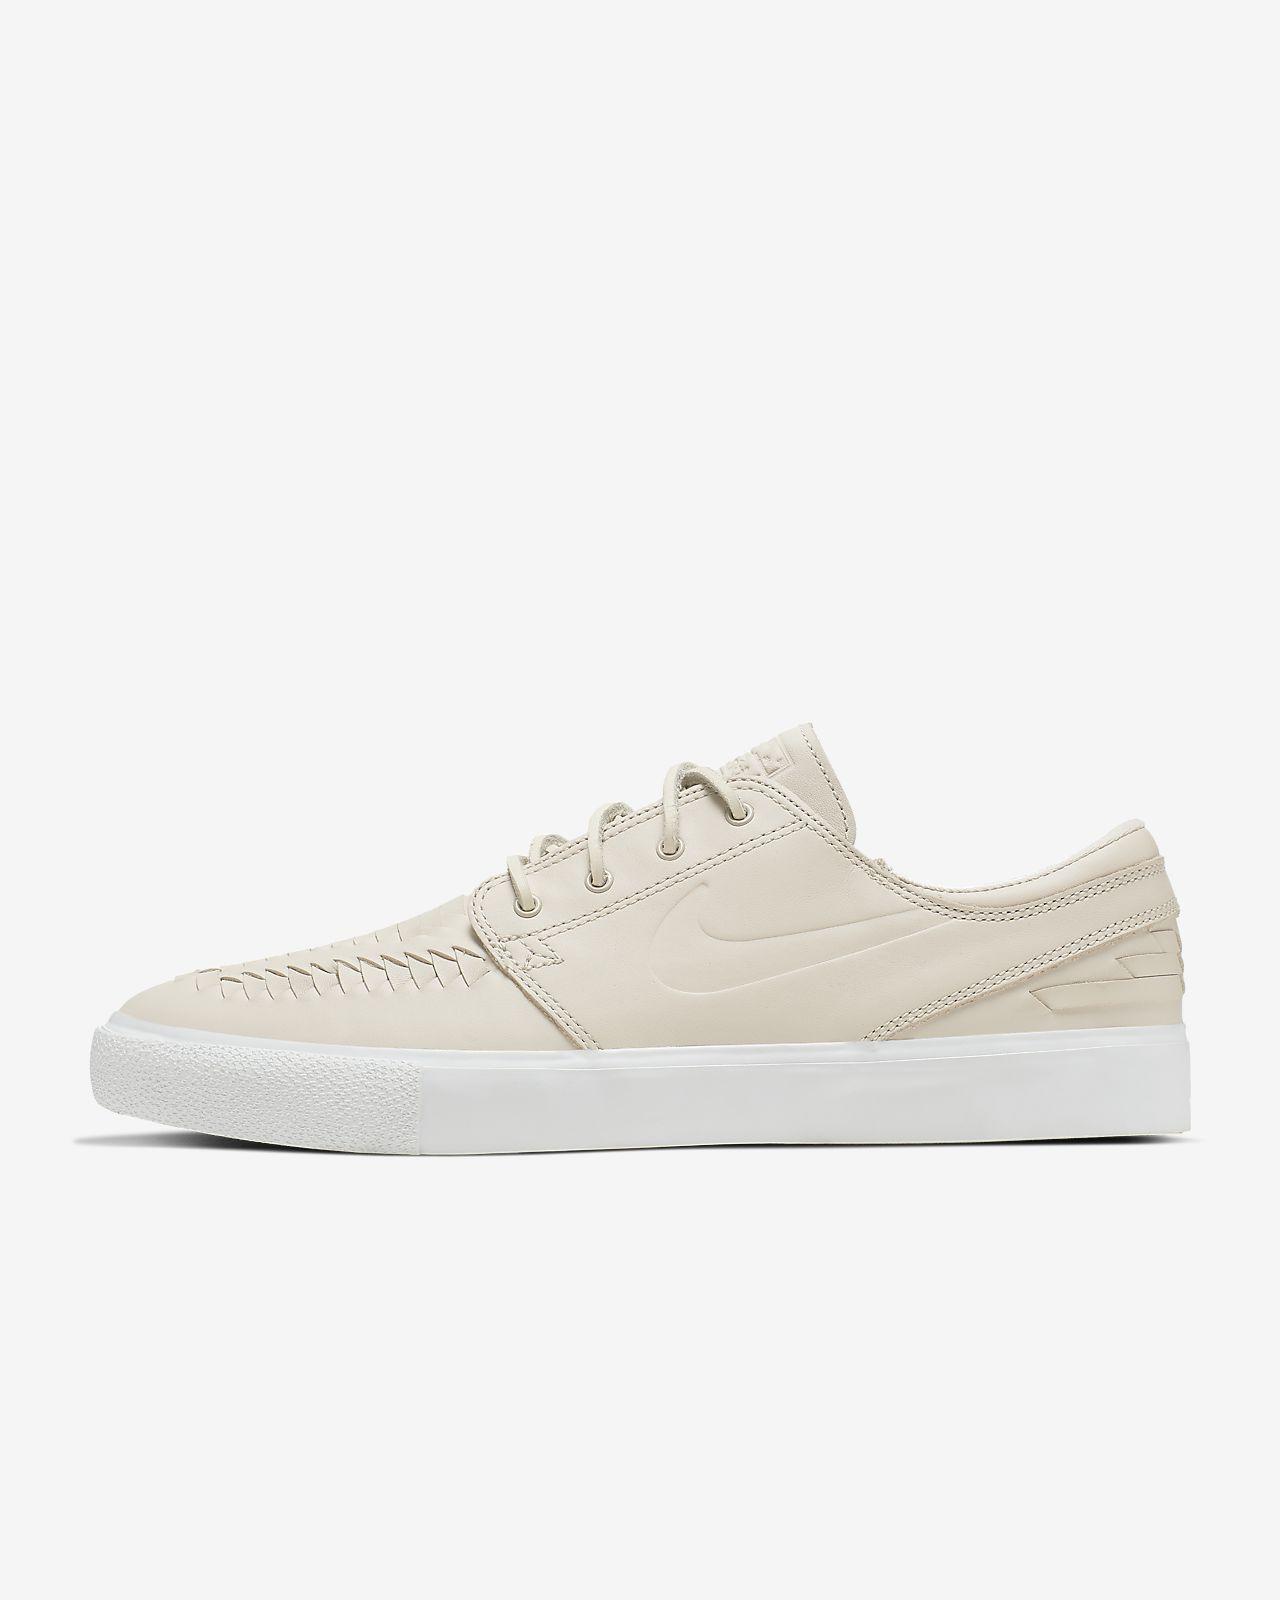 Nike SB Zoom Stefan Janoski RM Crafted Kaykay Ayakkabısı